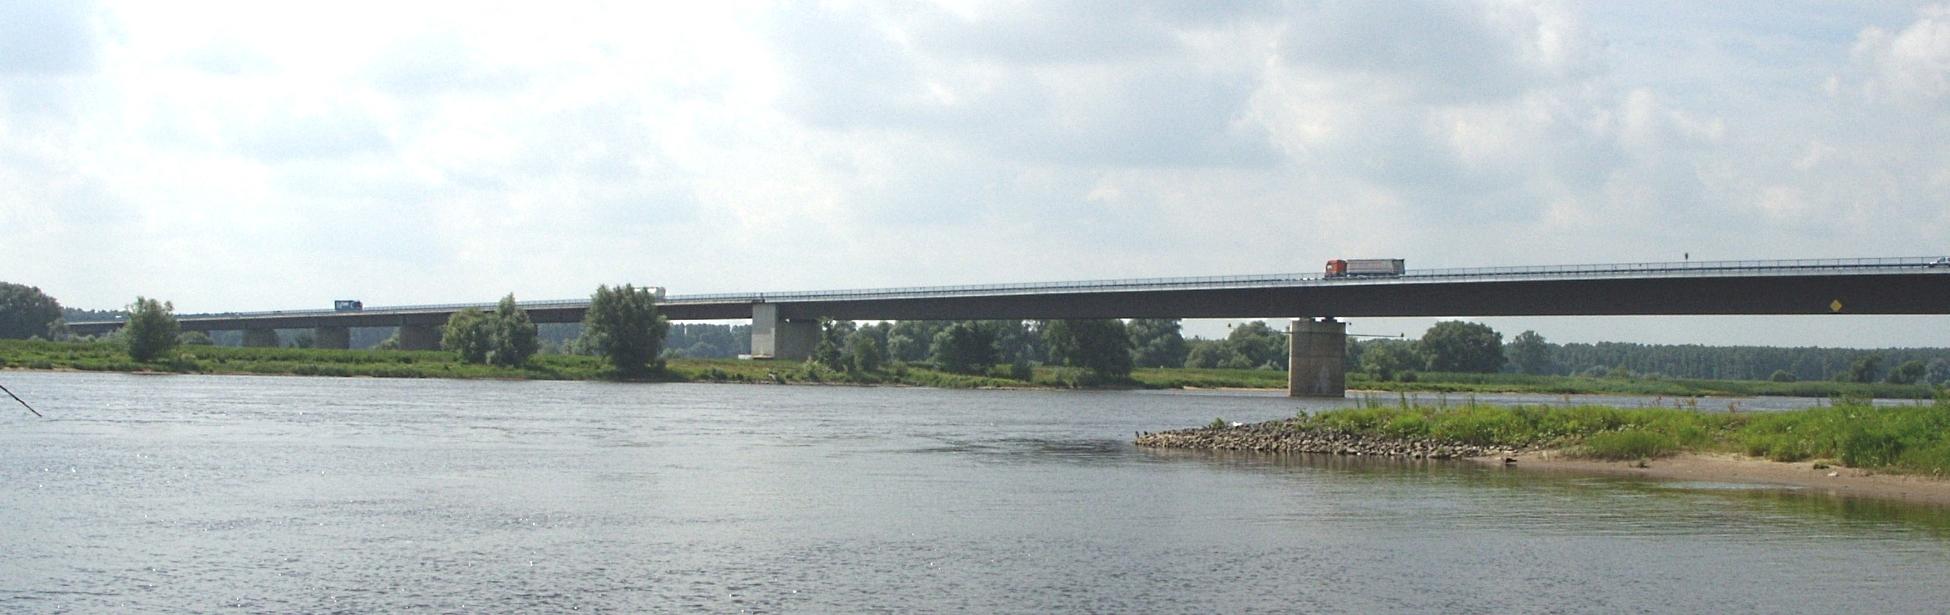 Elbebrücke bei Wittenberge - Quelle: Wikipedia